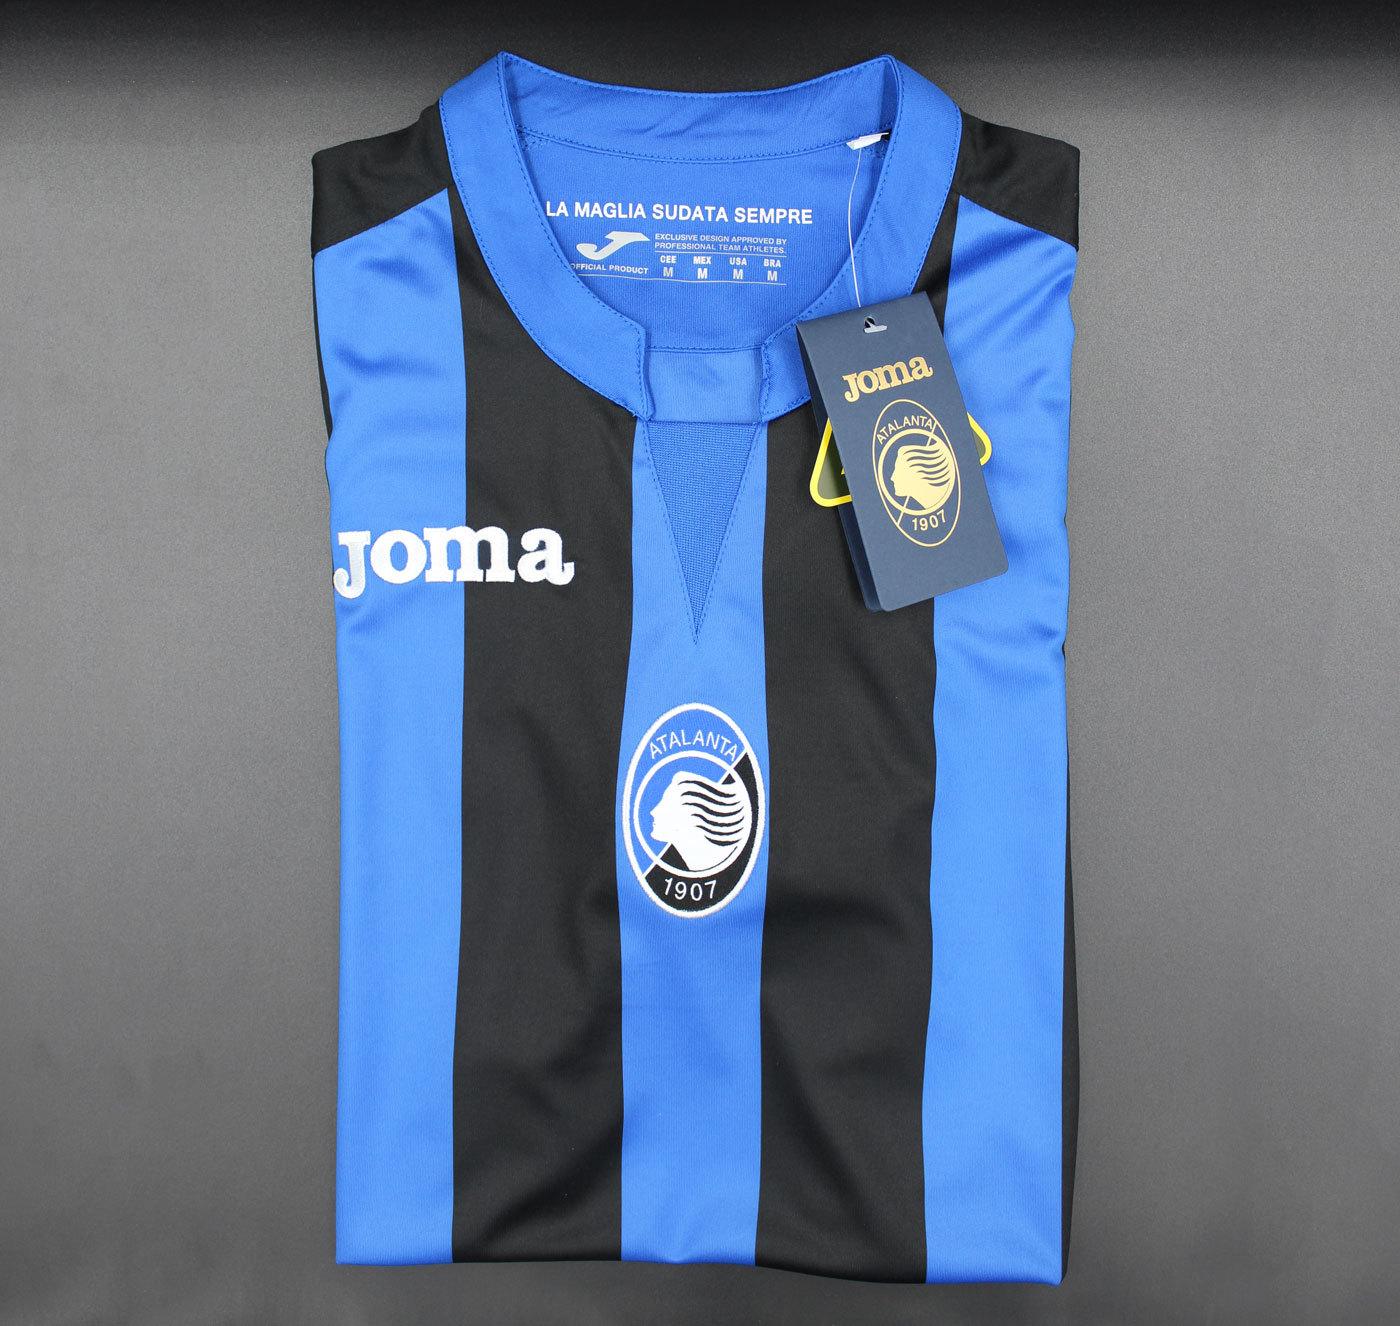 Atalanta B.C. 2018-2019 Home Short Sleeve Football Jersey - Size M [As worn by Iličić, Gómez & Zapata]